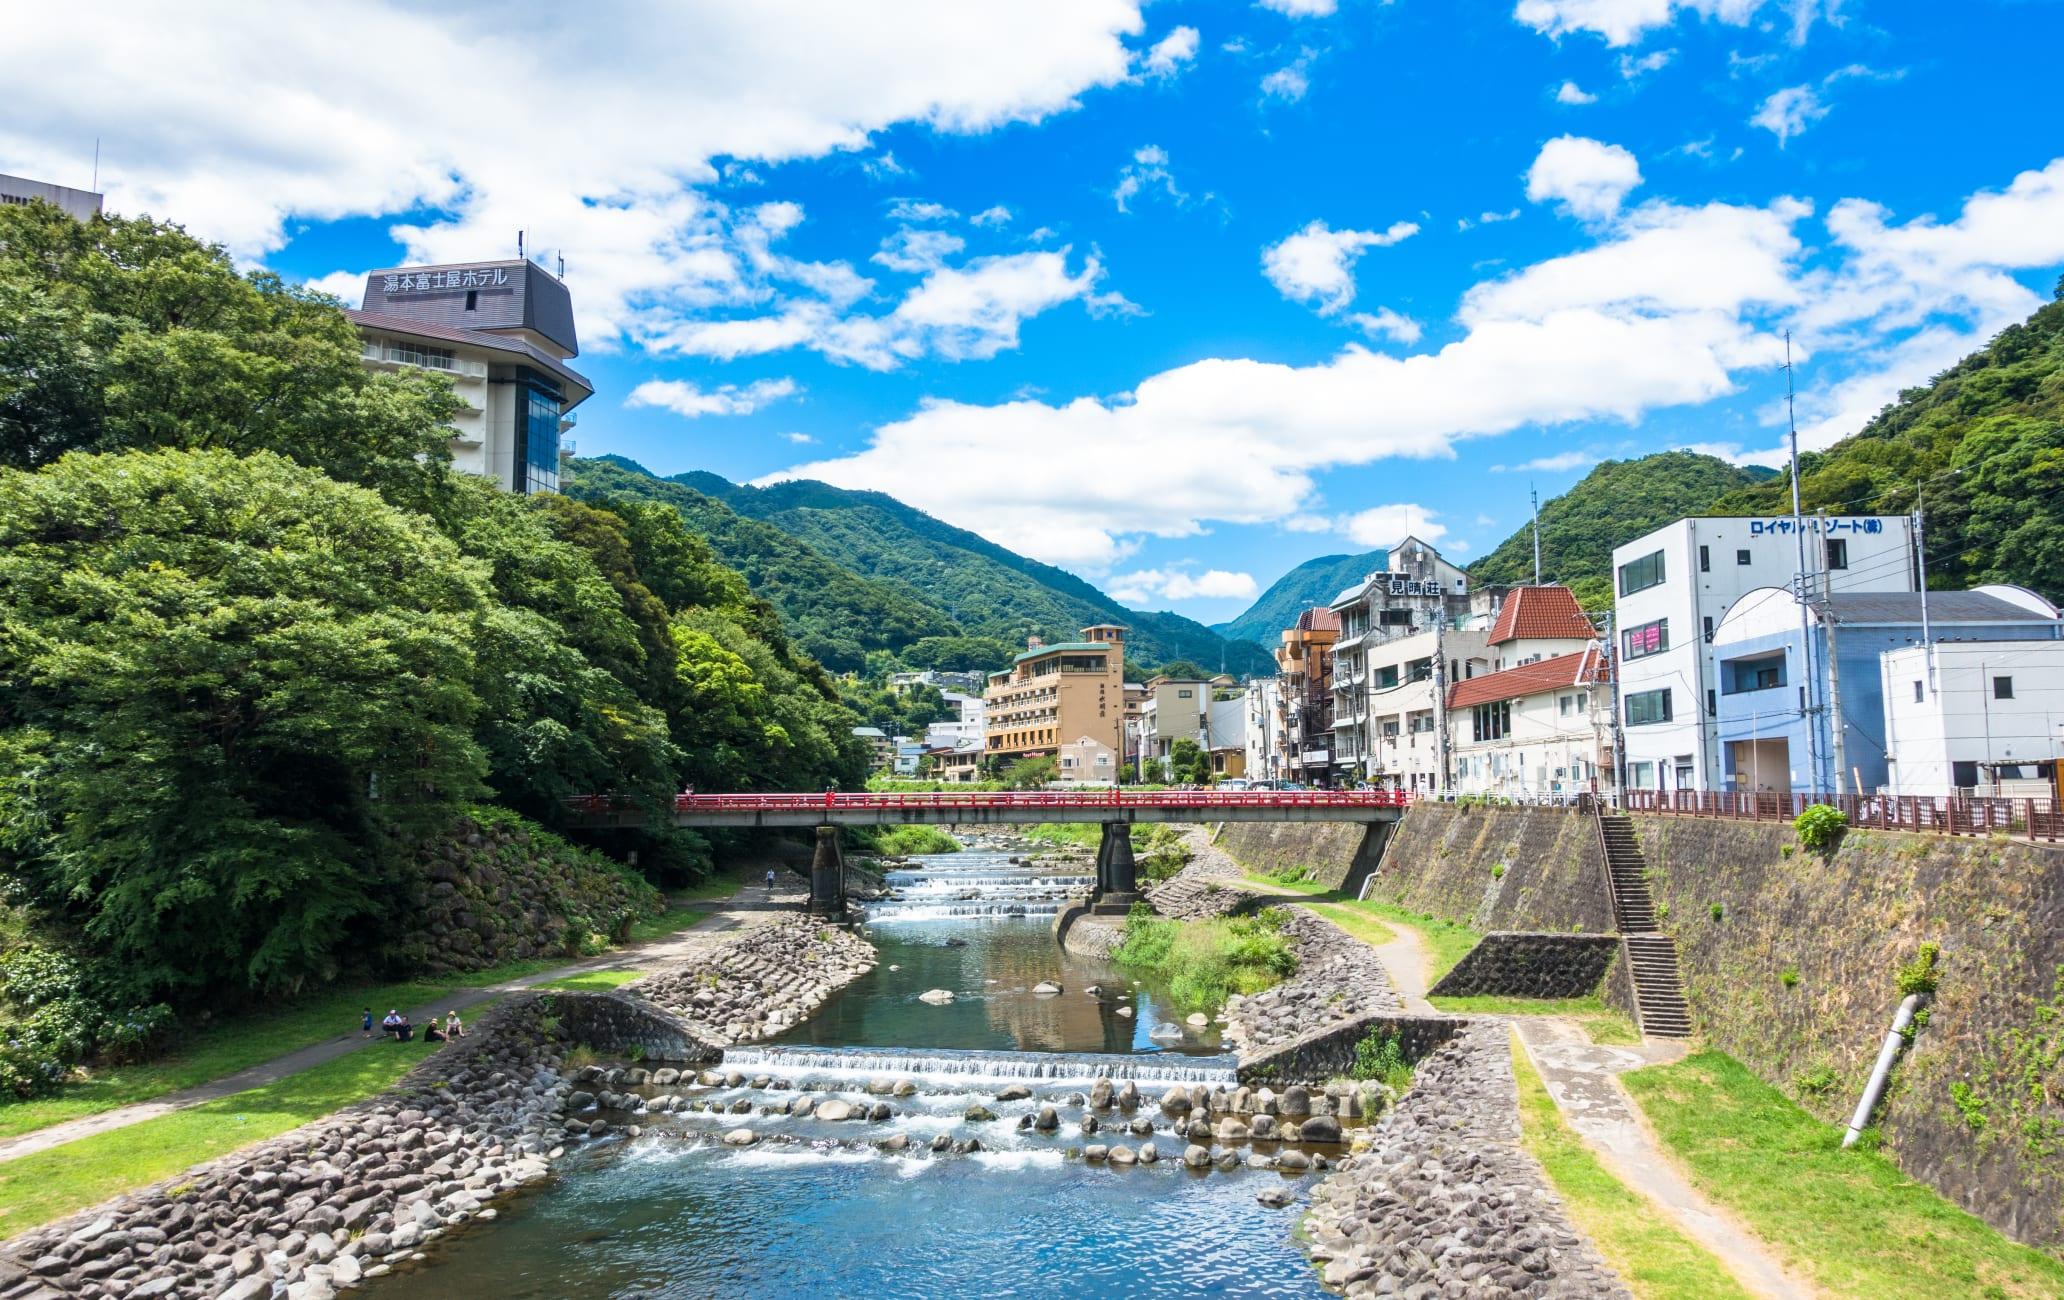 Hakone Yumoto-onsen Hot Spring